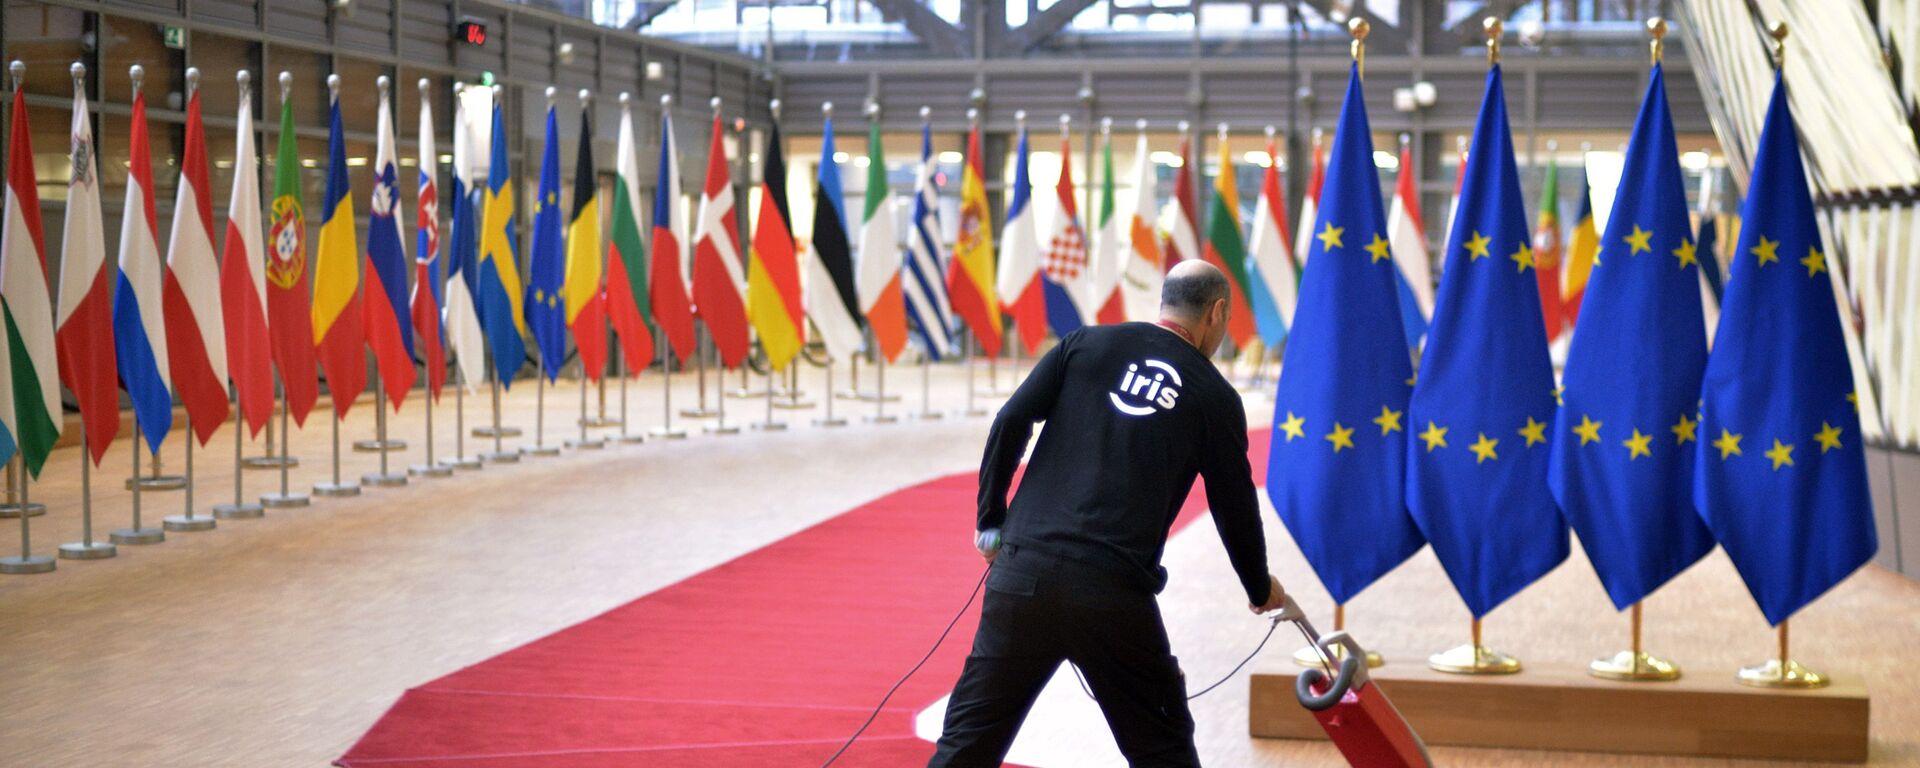 Саммит ЕС в Брюсселе - Sputnik Latvija, 1920, 15.06.2021